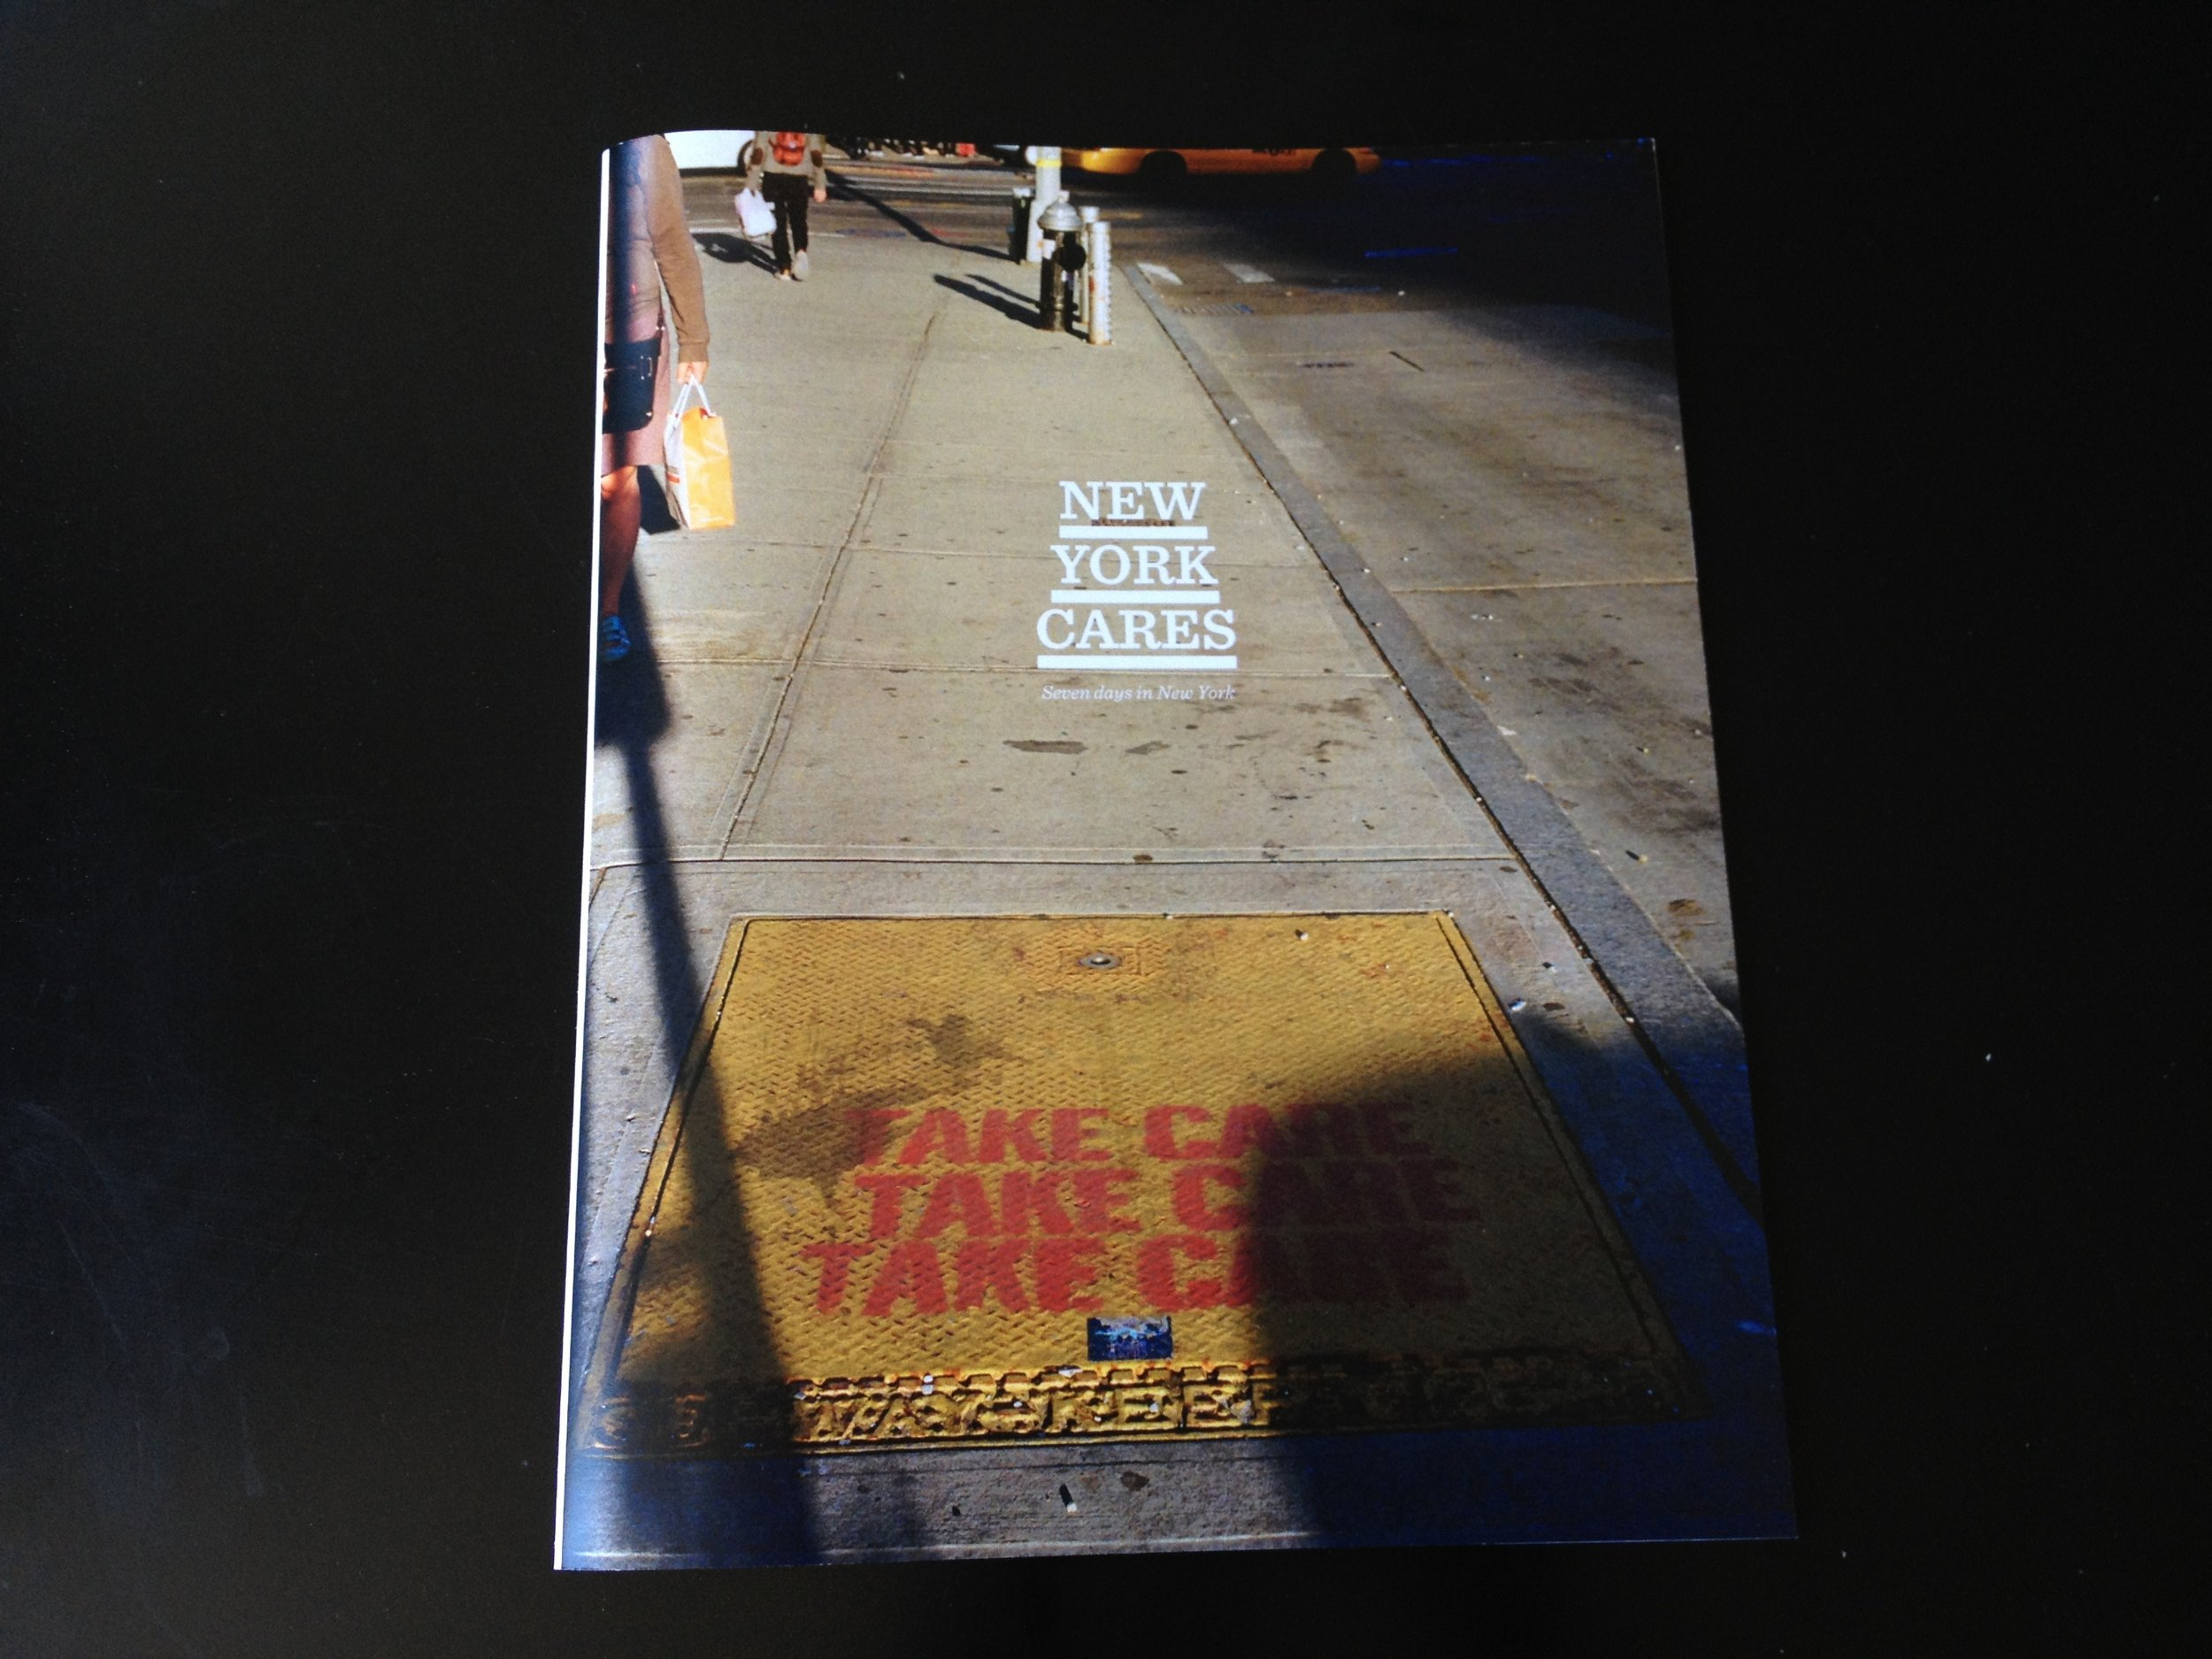 New York Cares - Self-published zine, 2012